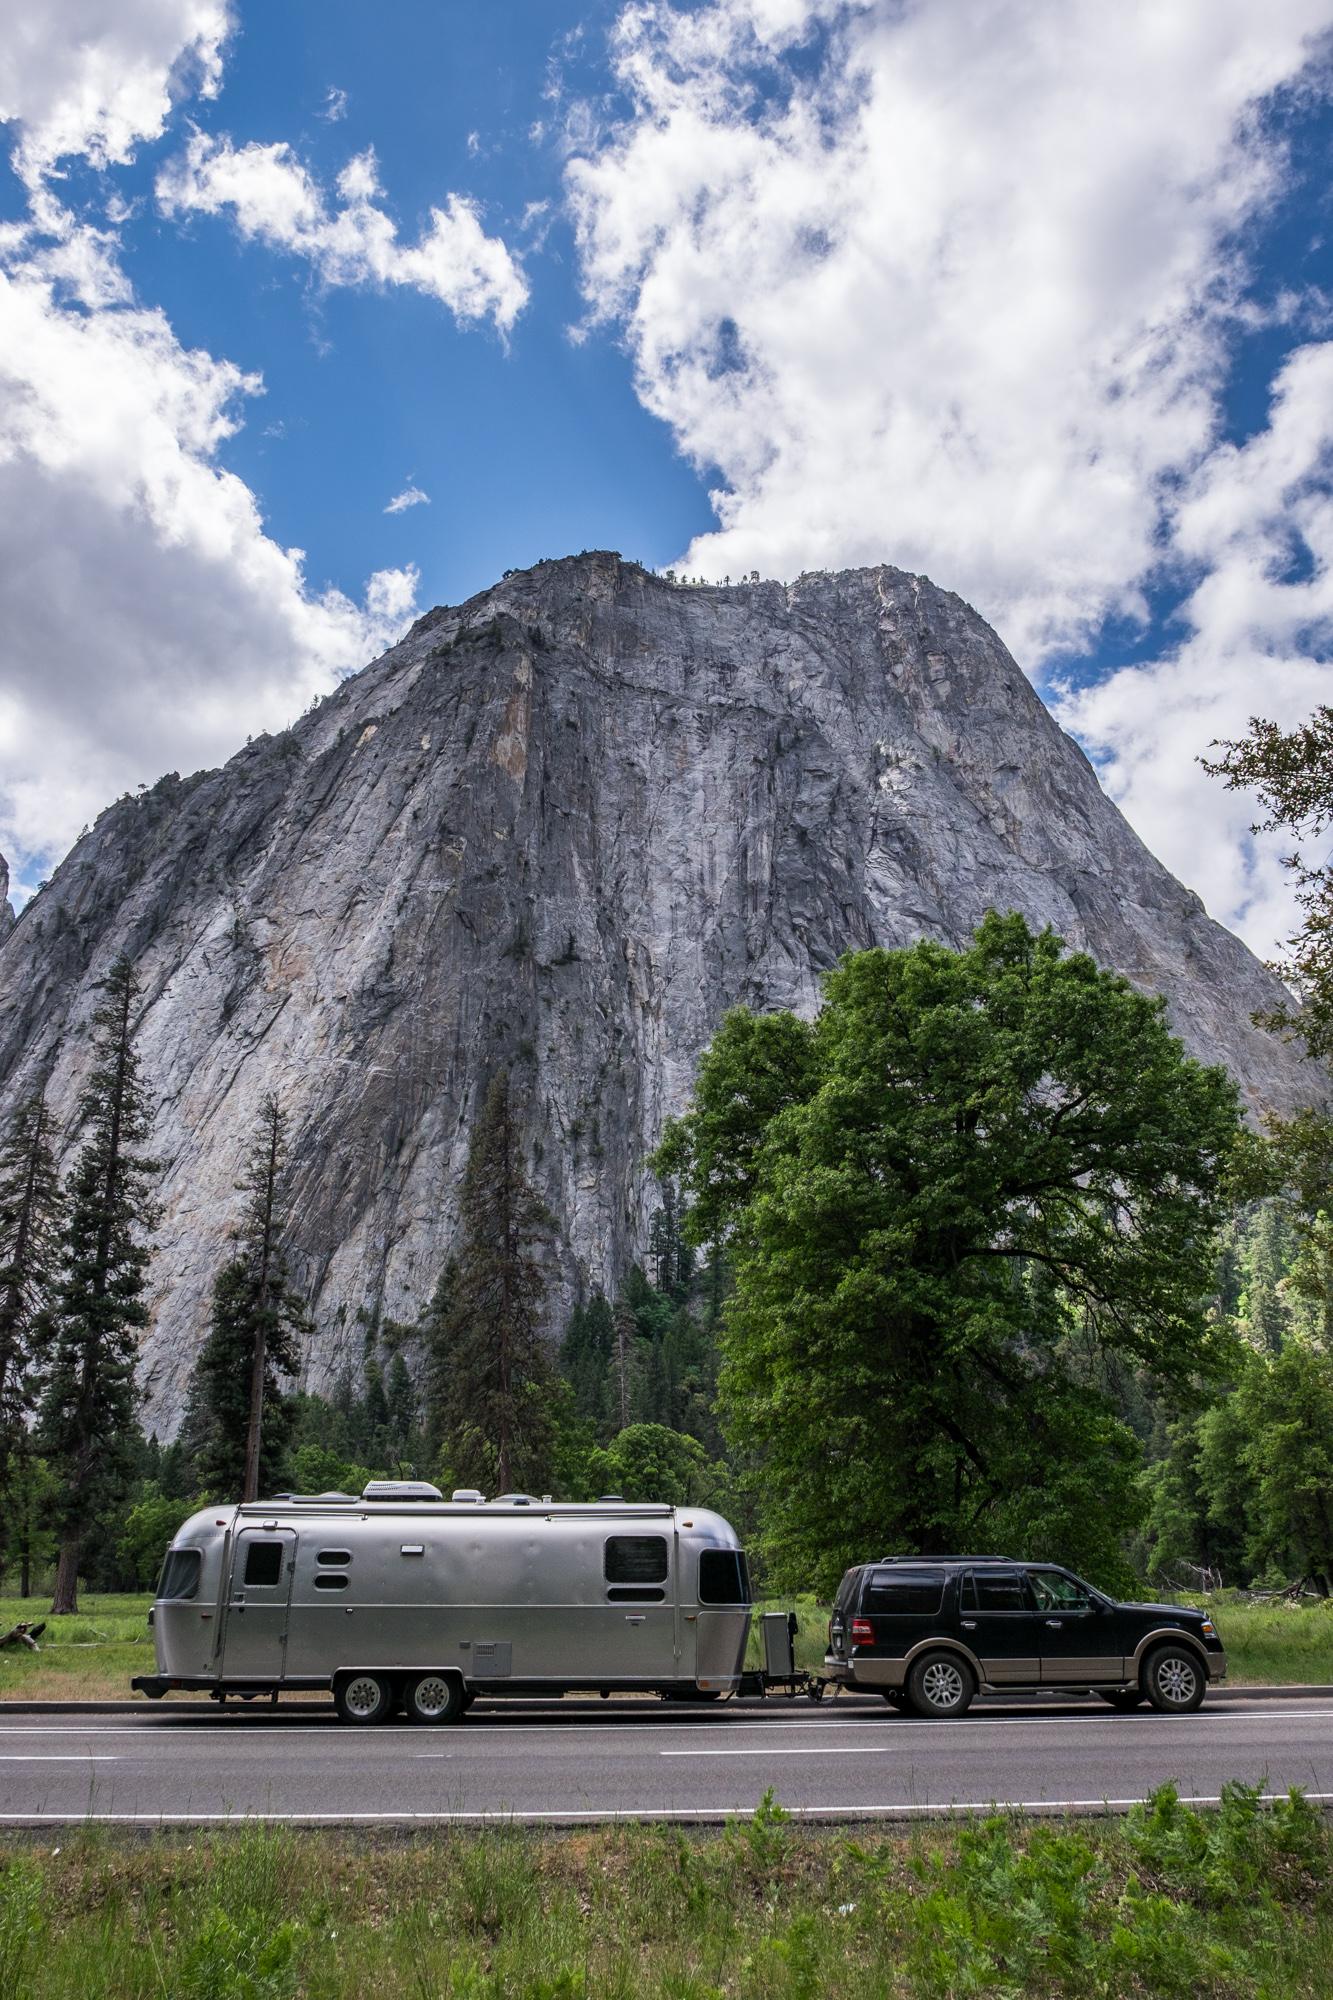 Yosemite National Park - 020.jpg